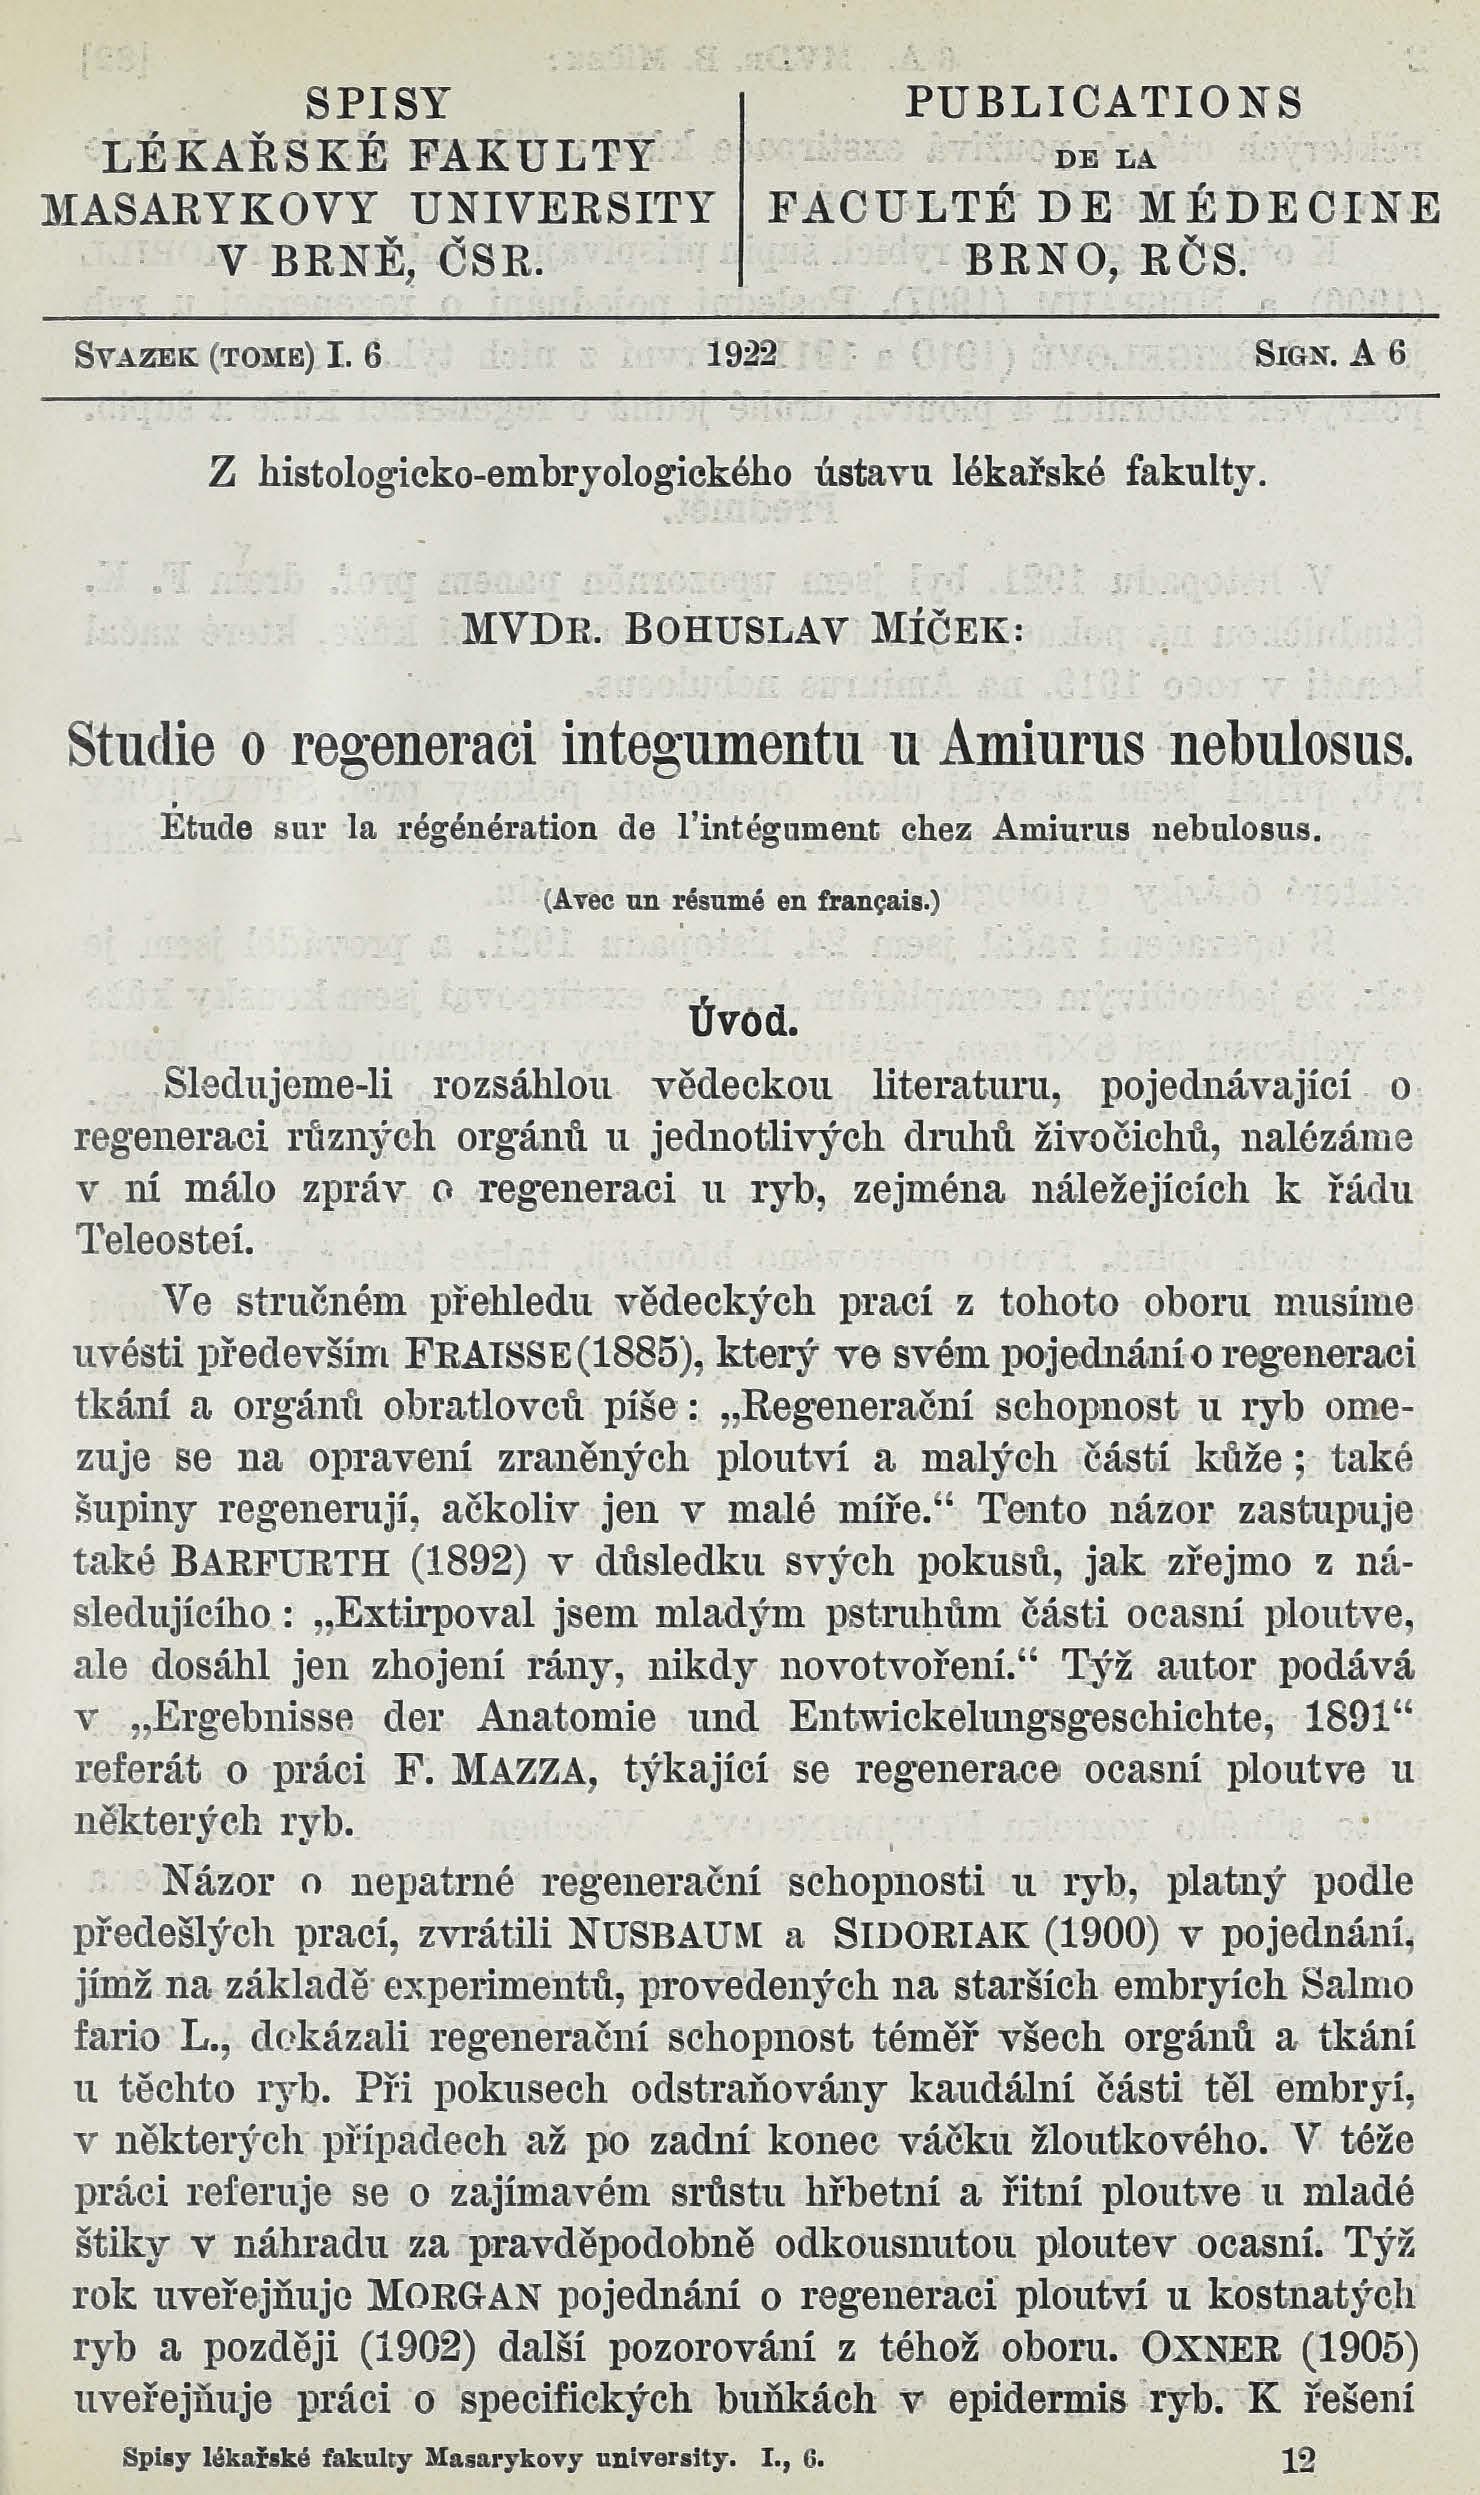 Obálka pro Studie o regeneraci integumentu v Amiurus nebulosus / Étude sur la régénération de l'intégument chez amiurus nebulosus